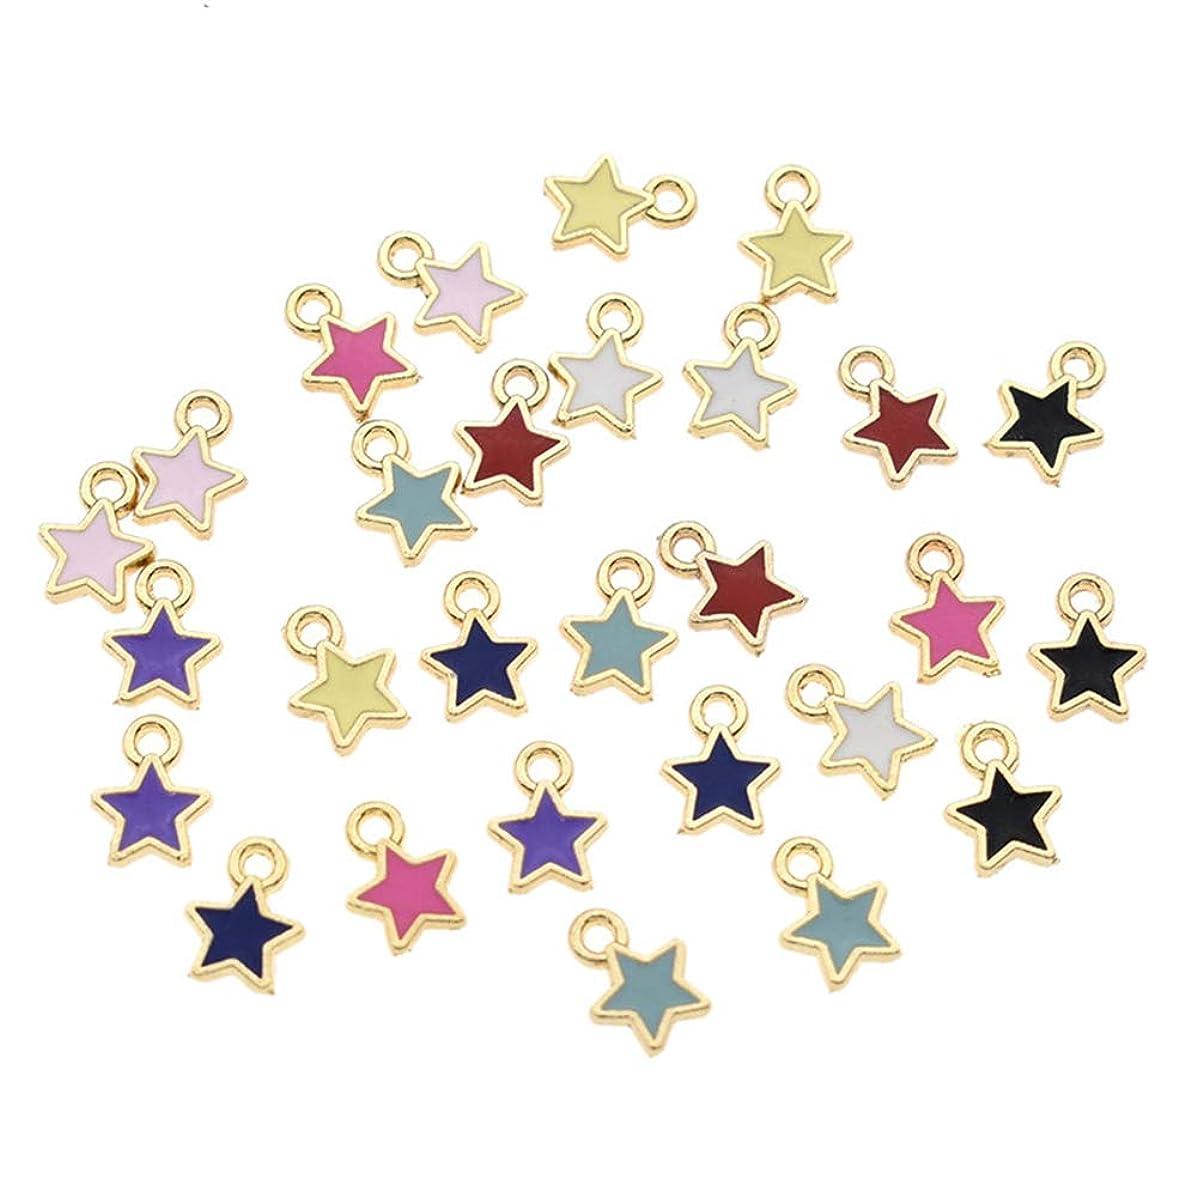 60pcs Multiple Colour Enamel Alloy Mini Star Charms Necklaces Bracelets Jewelry Accessories for DIY